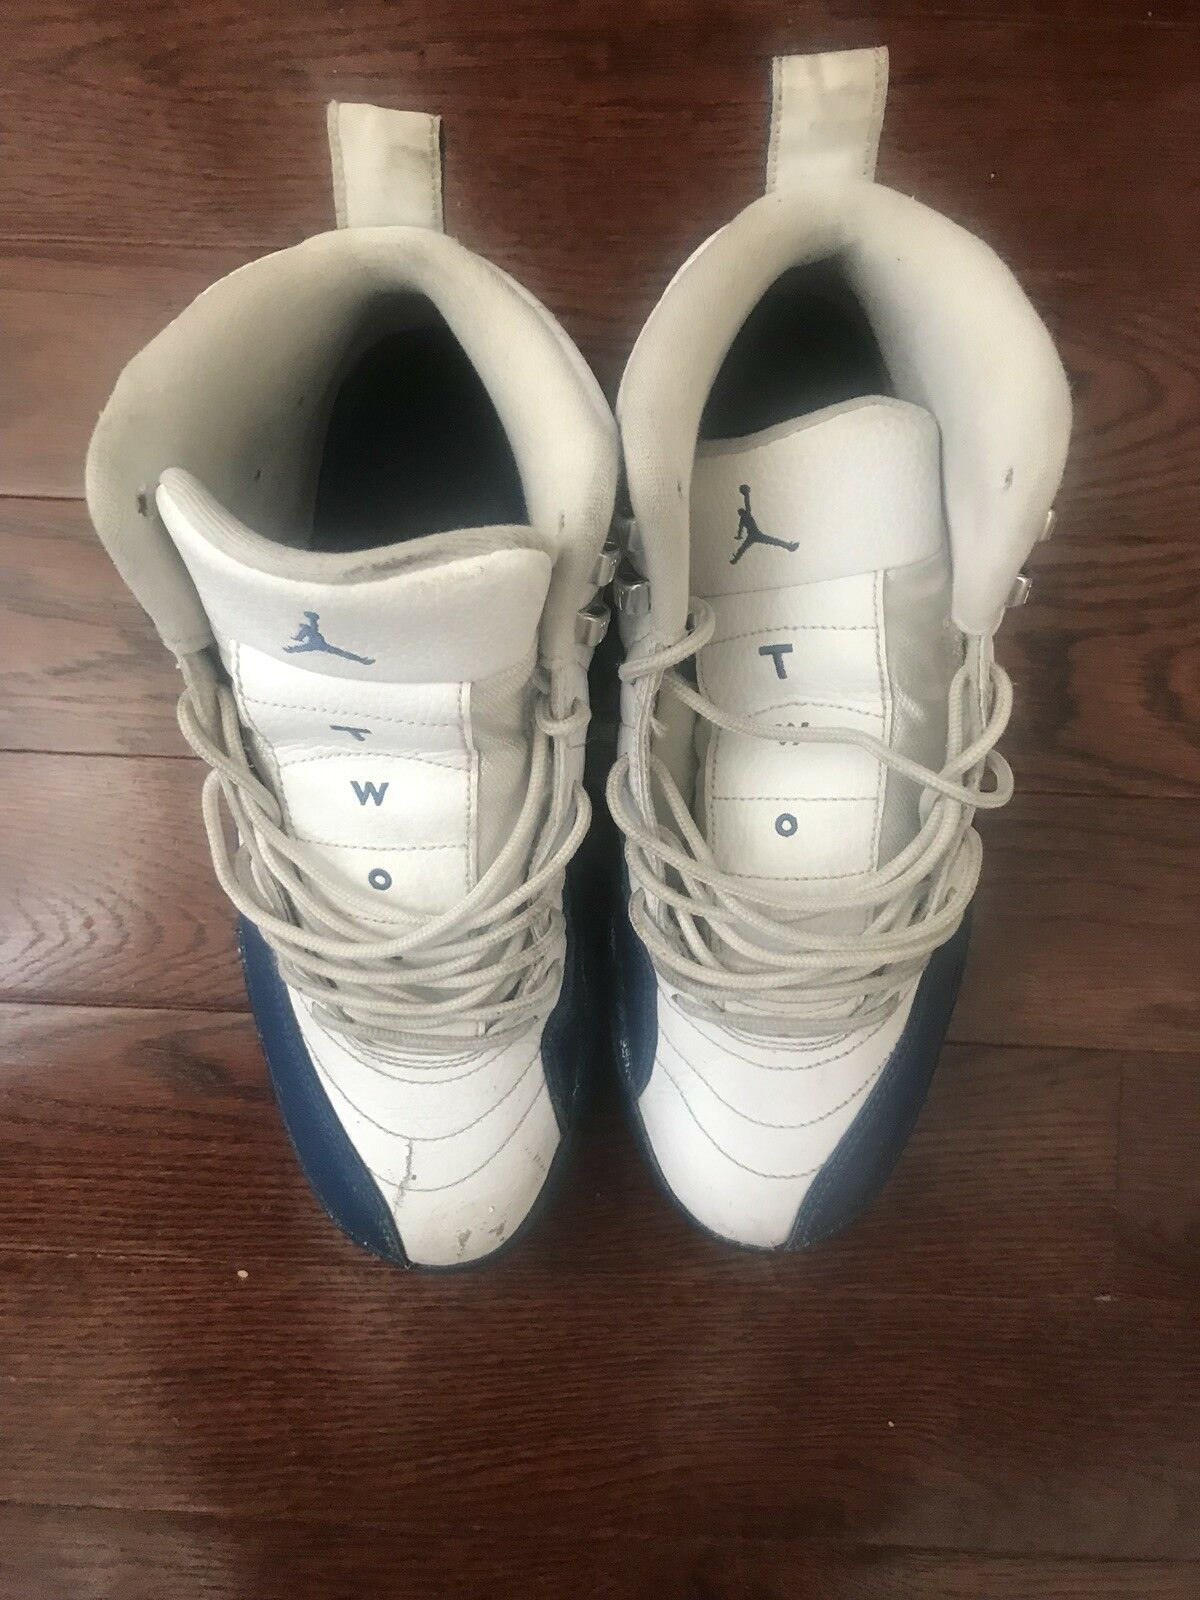 32881f26dea Nike Air Jordan 12 XII Retro French blueee Metallic Silver 130690 113 Sz 10  nccbgn2579-Athletic Shoes